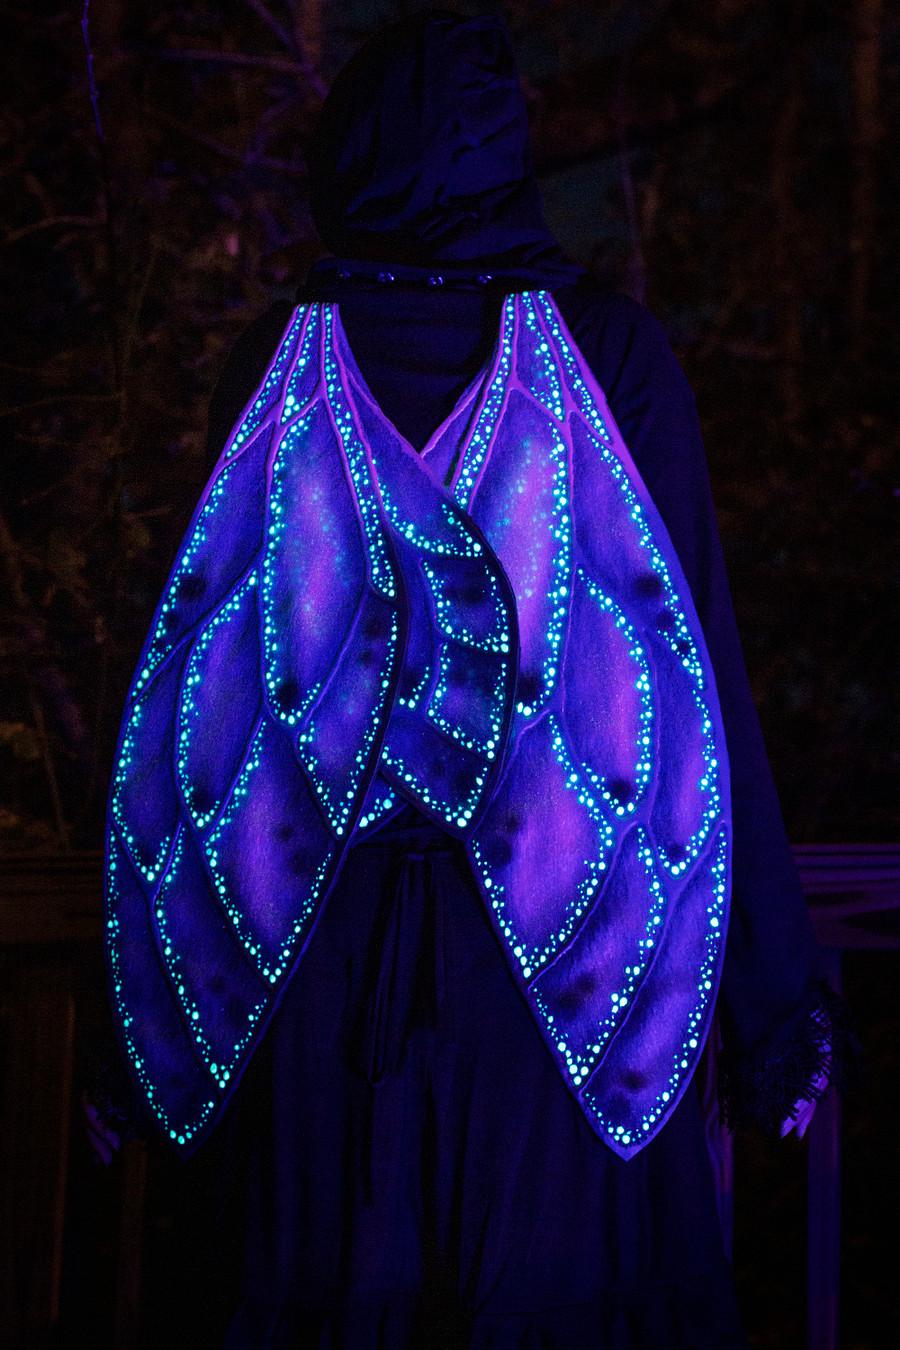 Aethervale Wings glowing underneath a blacklight